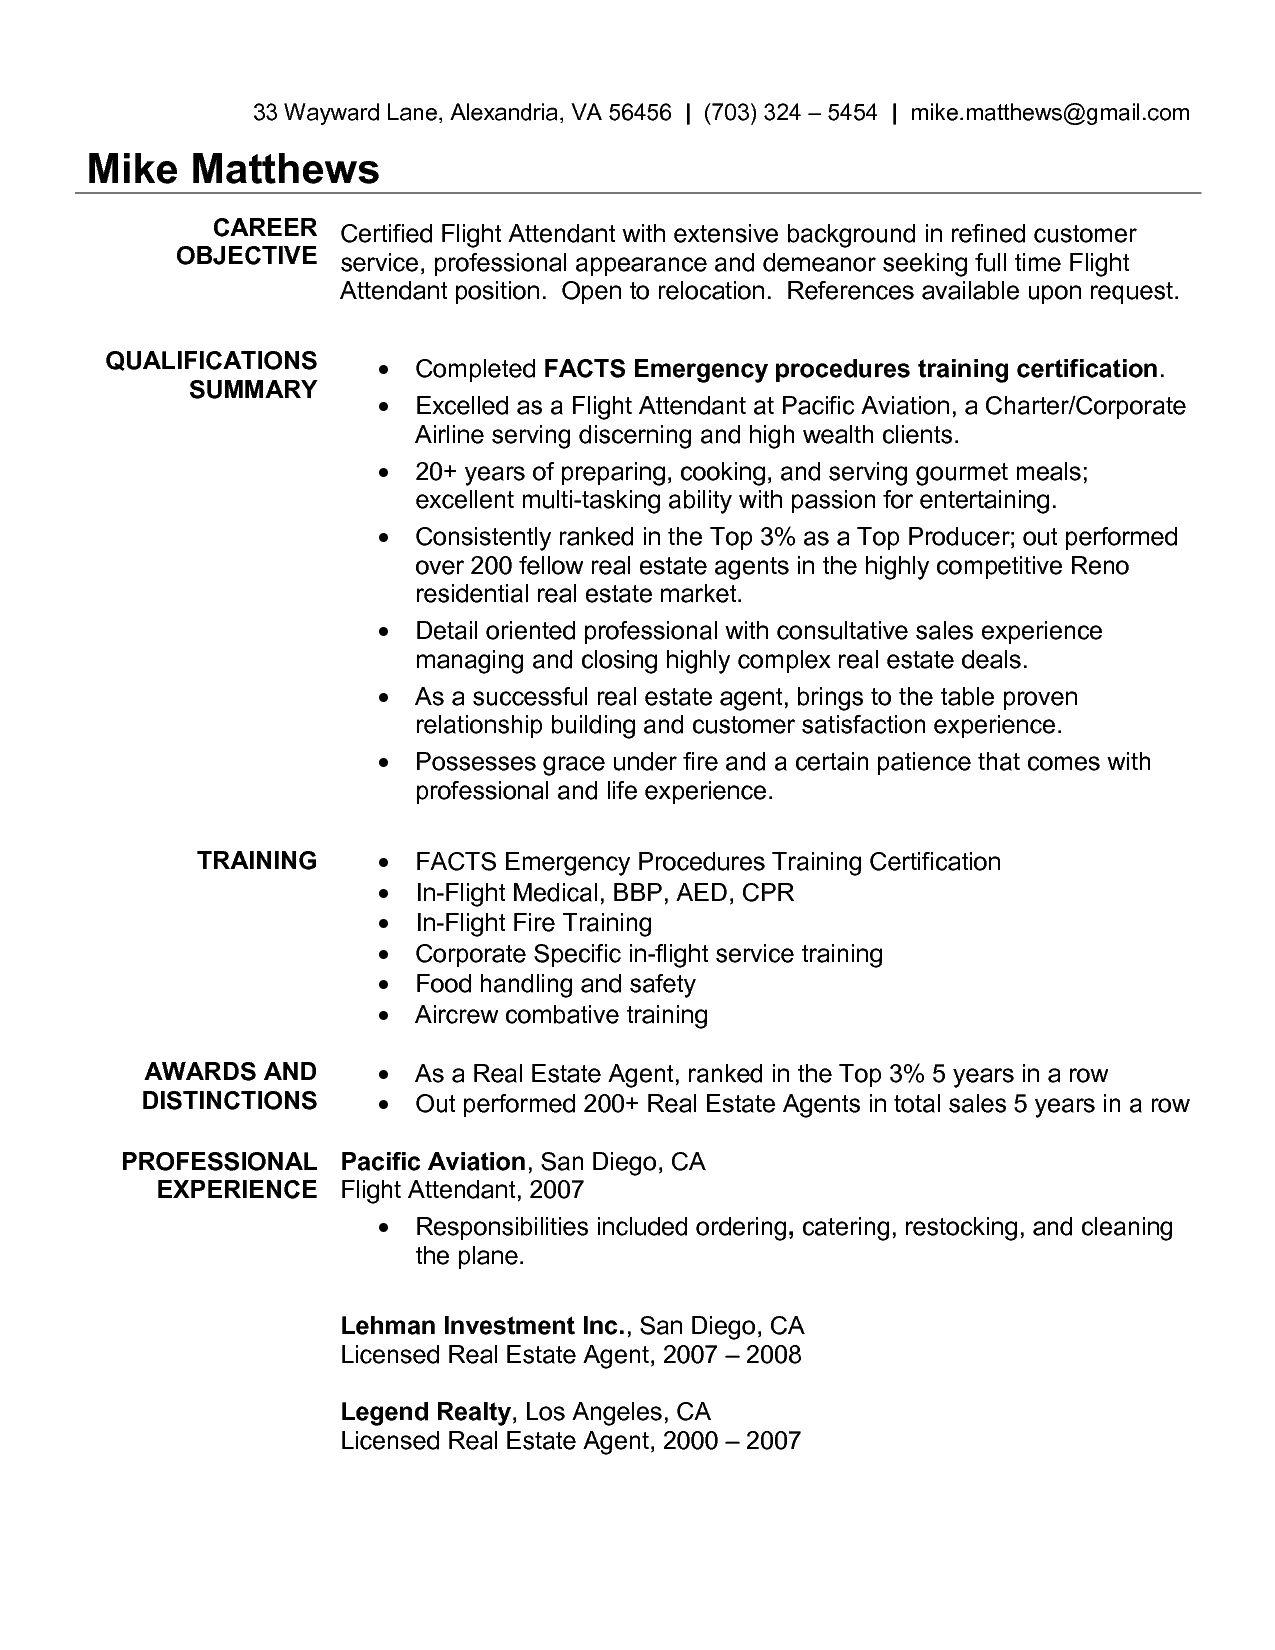 23 flight attendant cover letter in 2020 flight